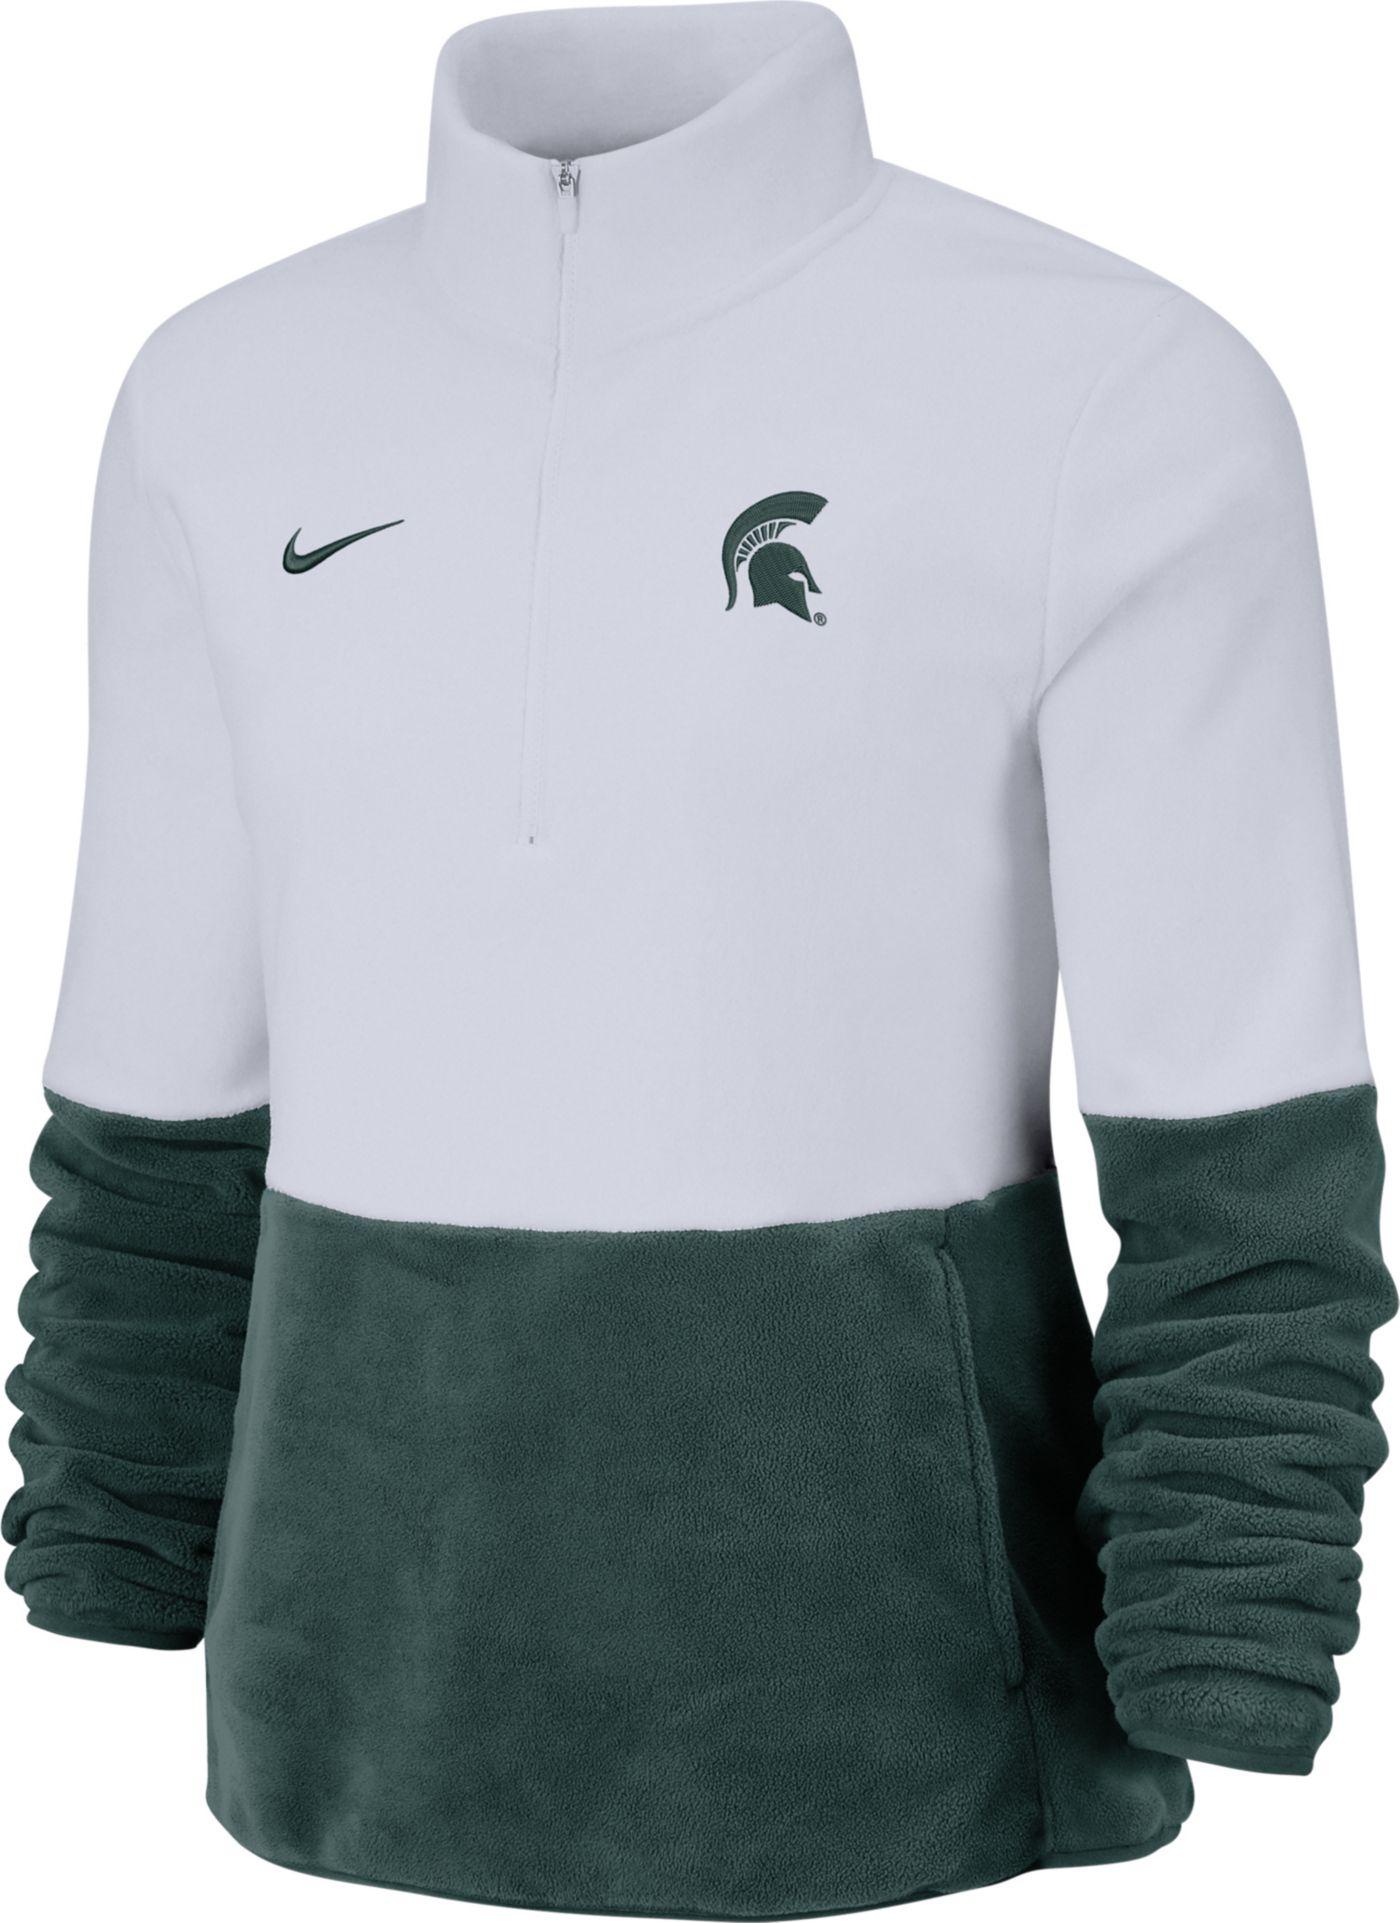 Nike Women's Michigan State Spartans Cozy Therma White Half-Zip Fleece